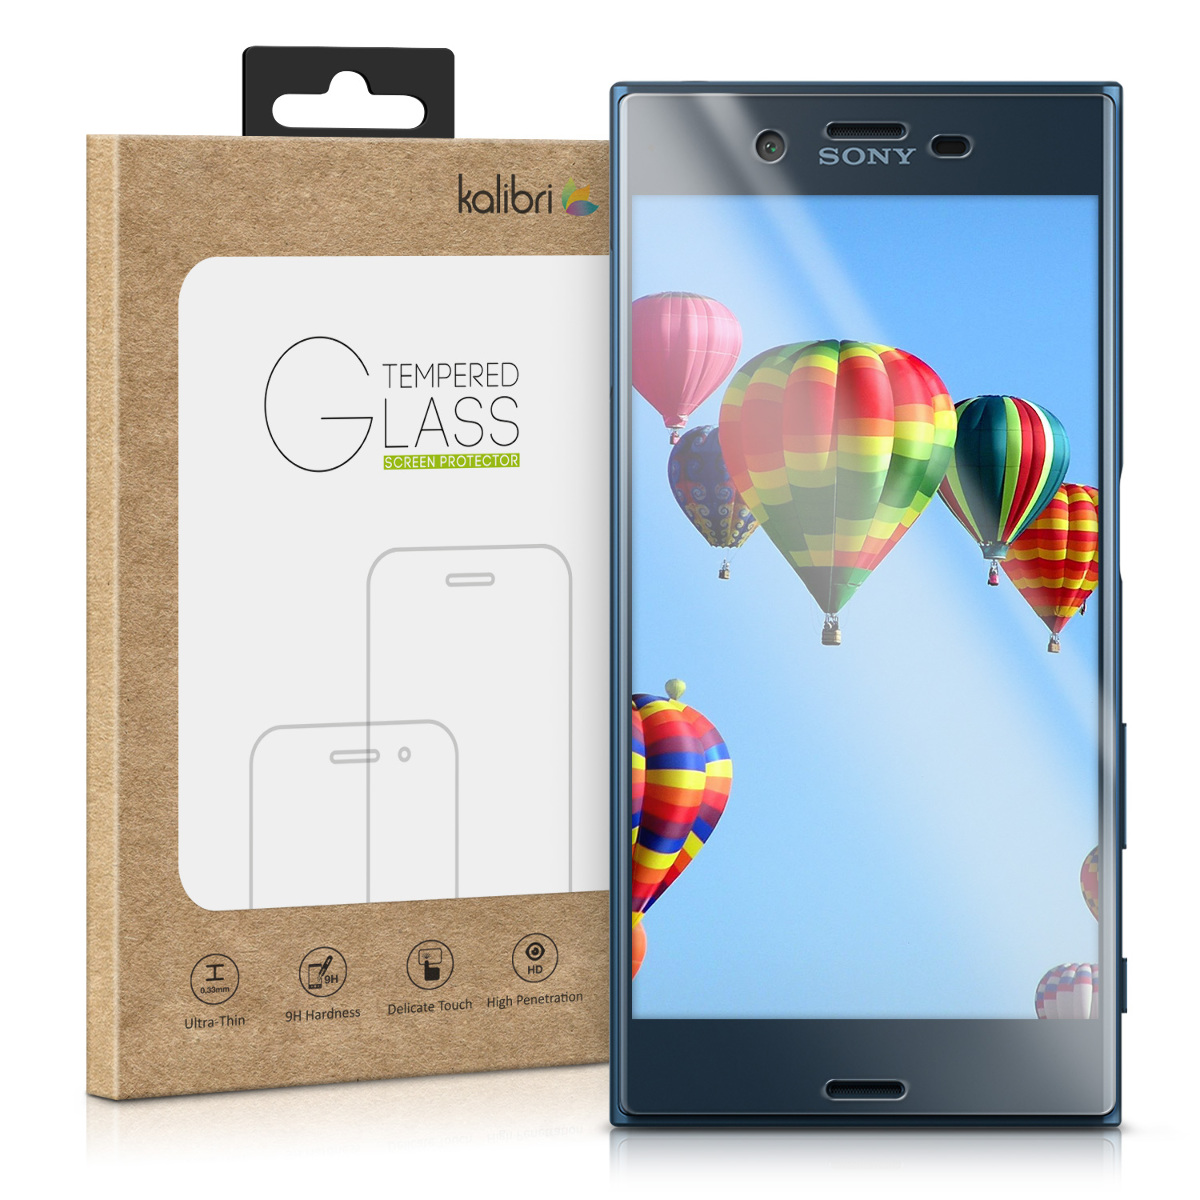 Kalibri Tempered Glass - Αντιχαρακτικό Γυαλί Οθόνης Sony Xperia XZ / XZs - Transparent Frame (40453.03)